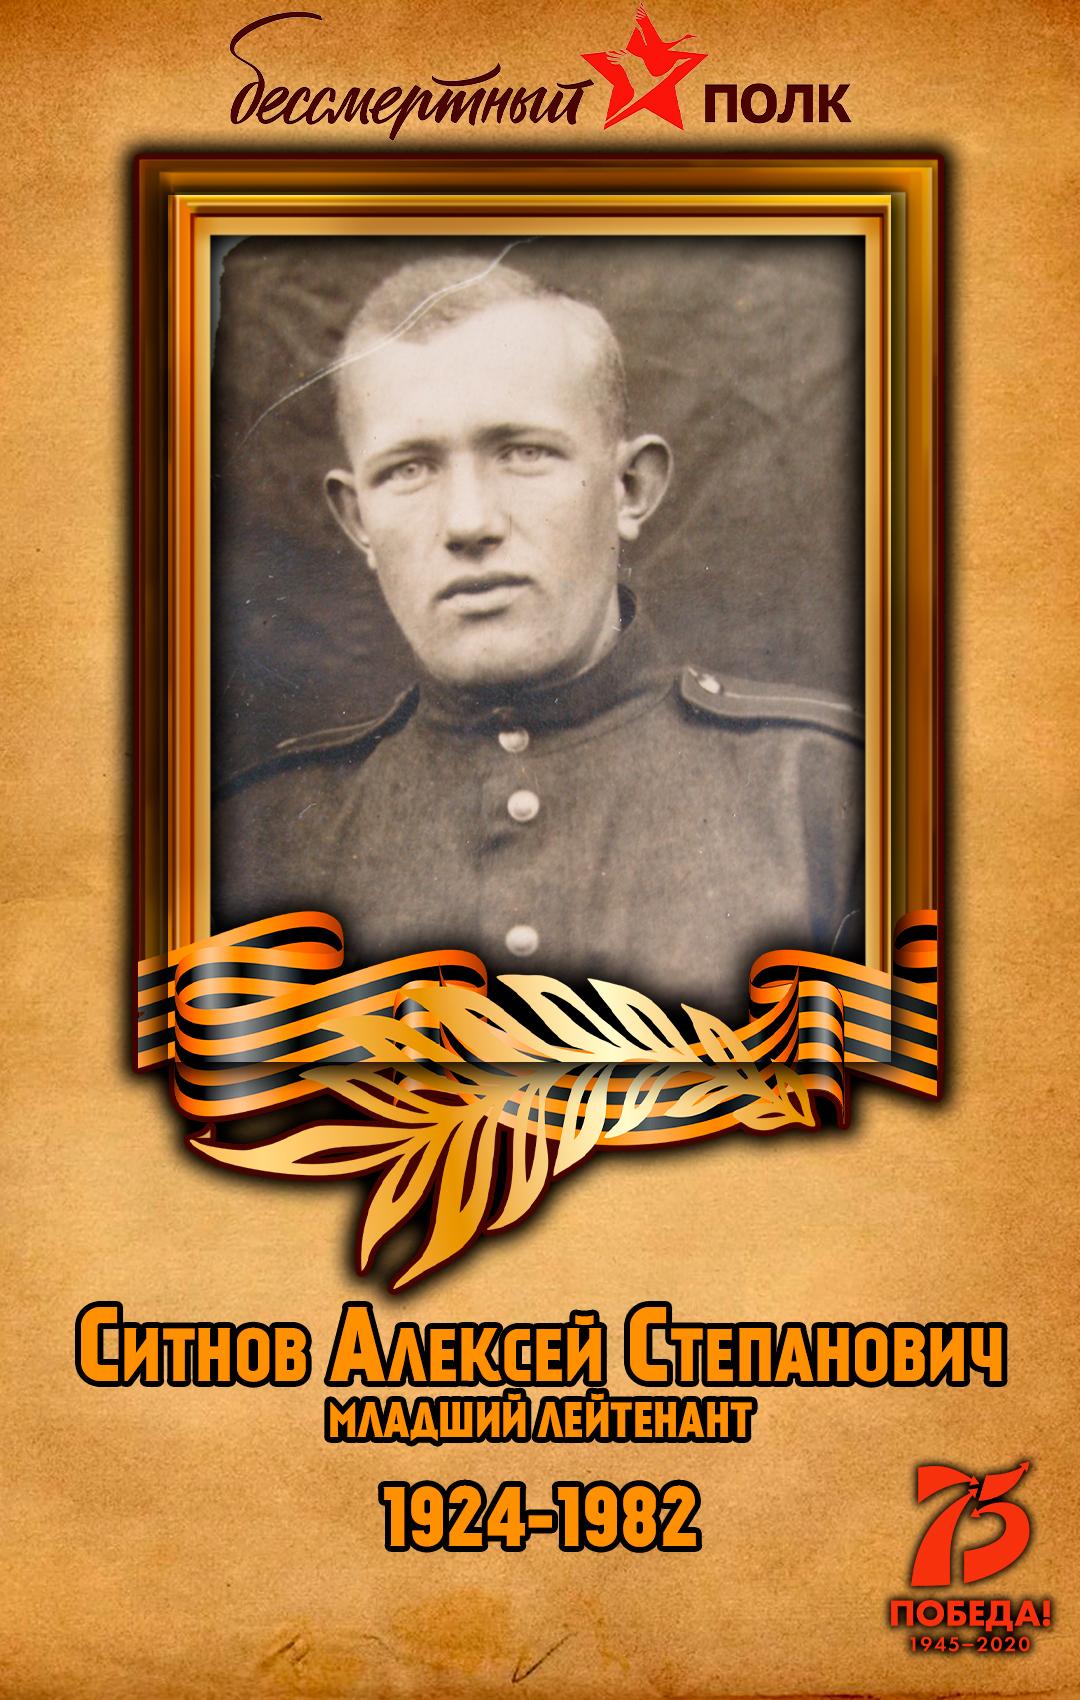 Ситнов-Алексей-Степанович